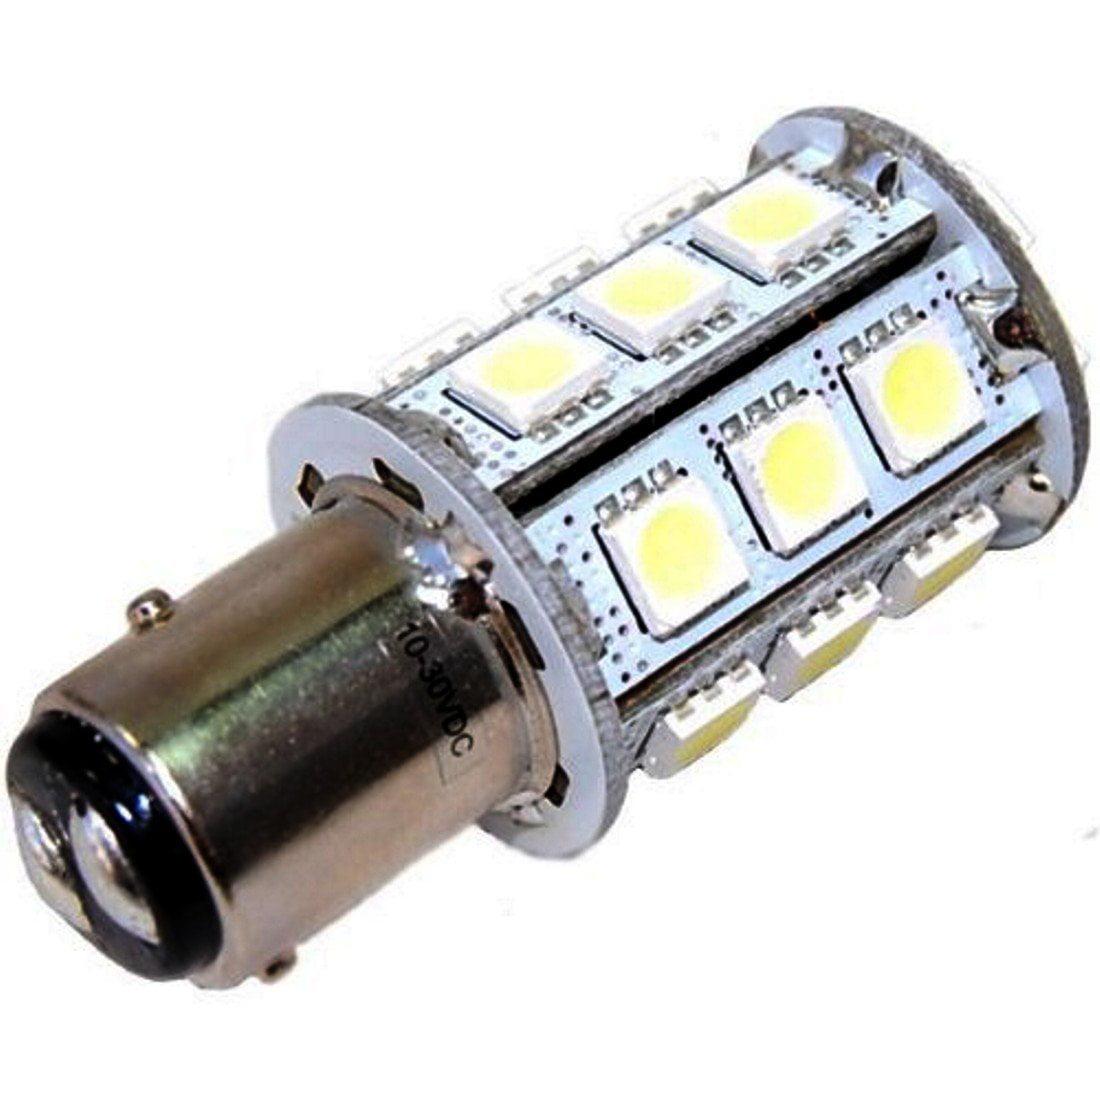 Perko navigation lights AquaSignal HQRP BAY15d Base 24 SMD LED Bulb for Hella